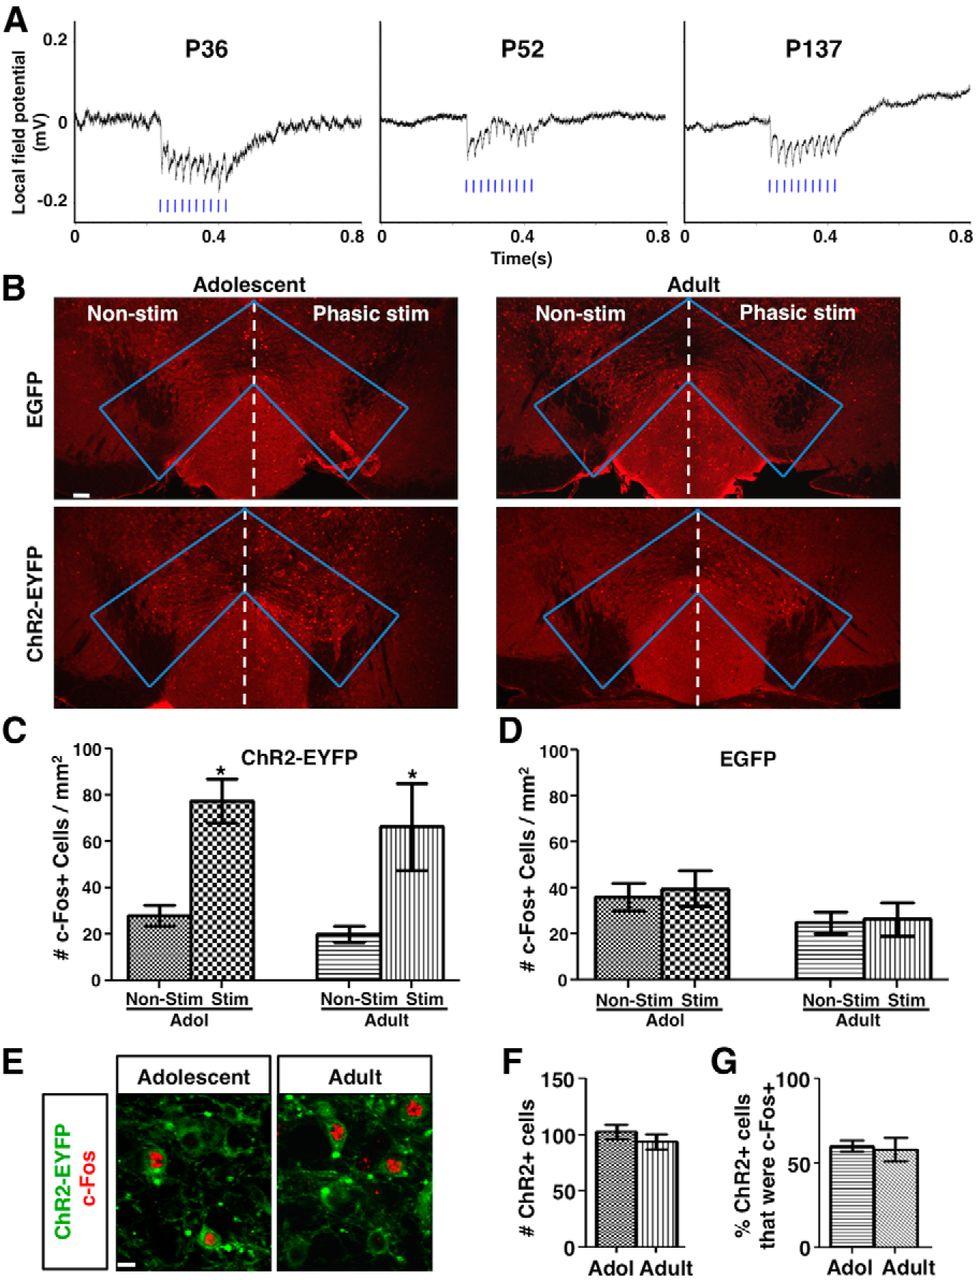 Phasic Dopamine Neuron Activity Elicits Unique Mesofrontal